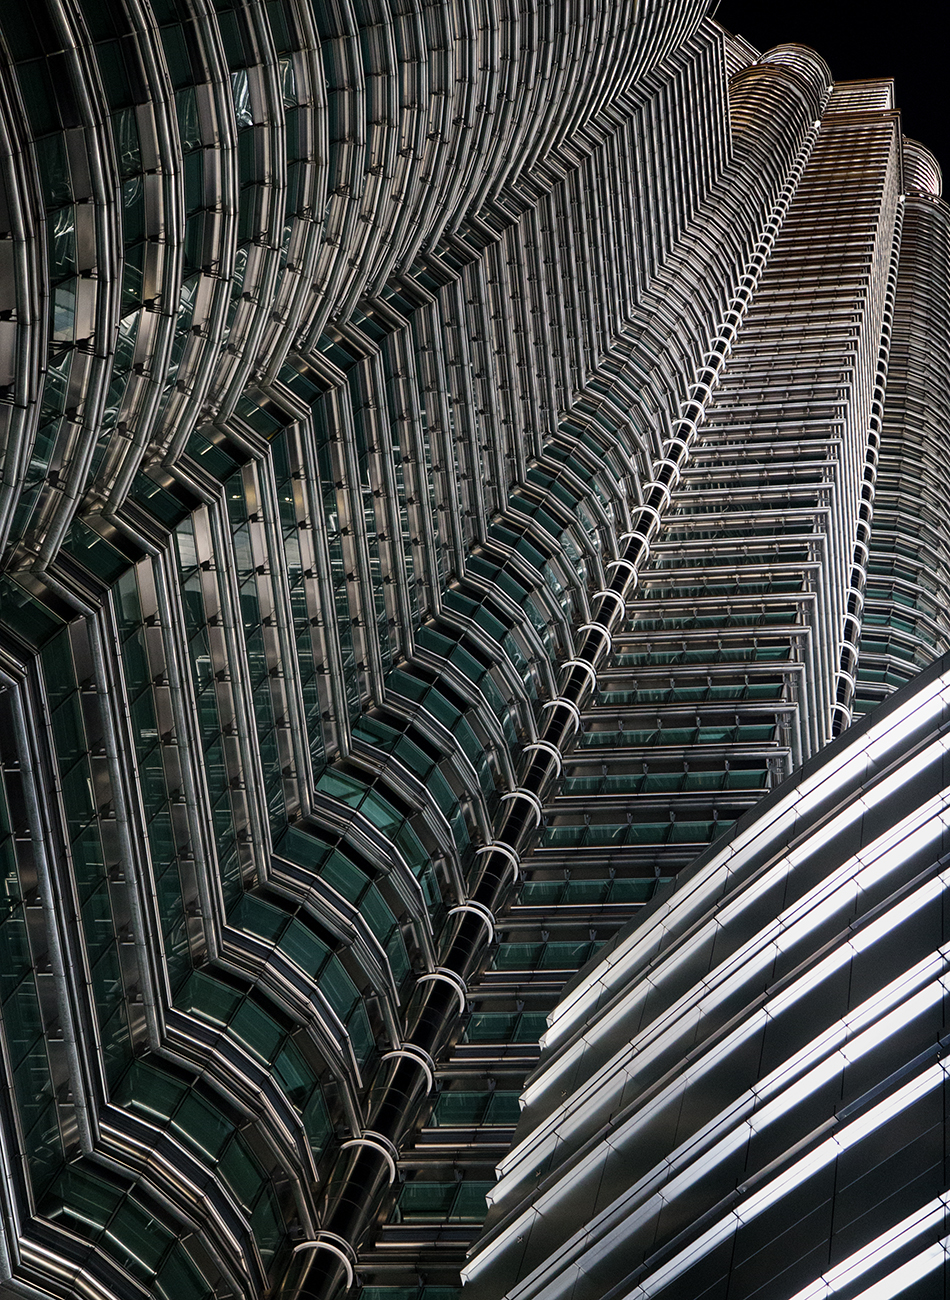 Fabian Fröhlich, Kuala Lumpur, Petronas Twin Towers,  Facade at Night